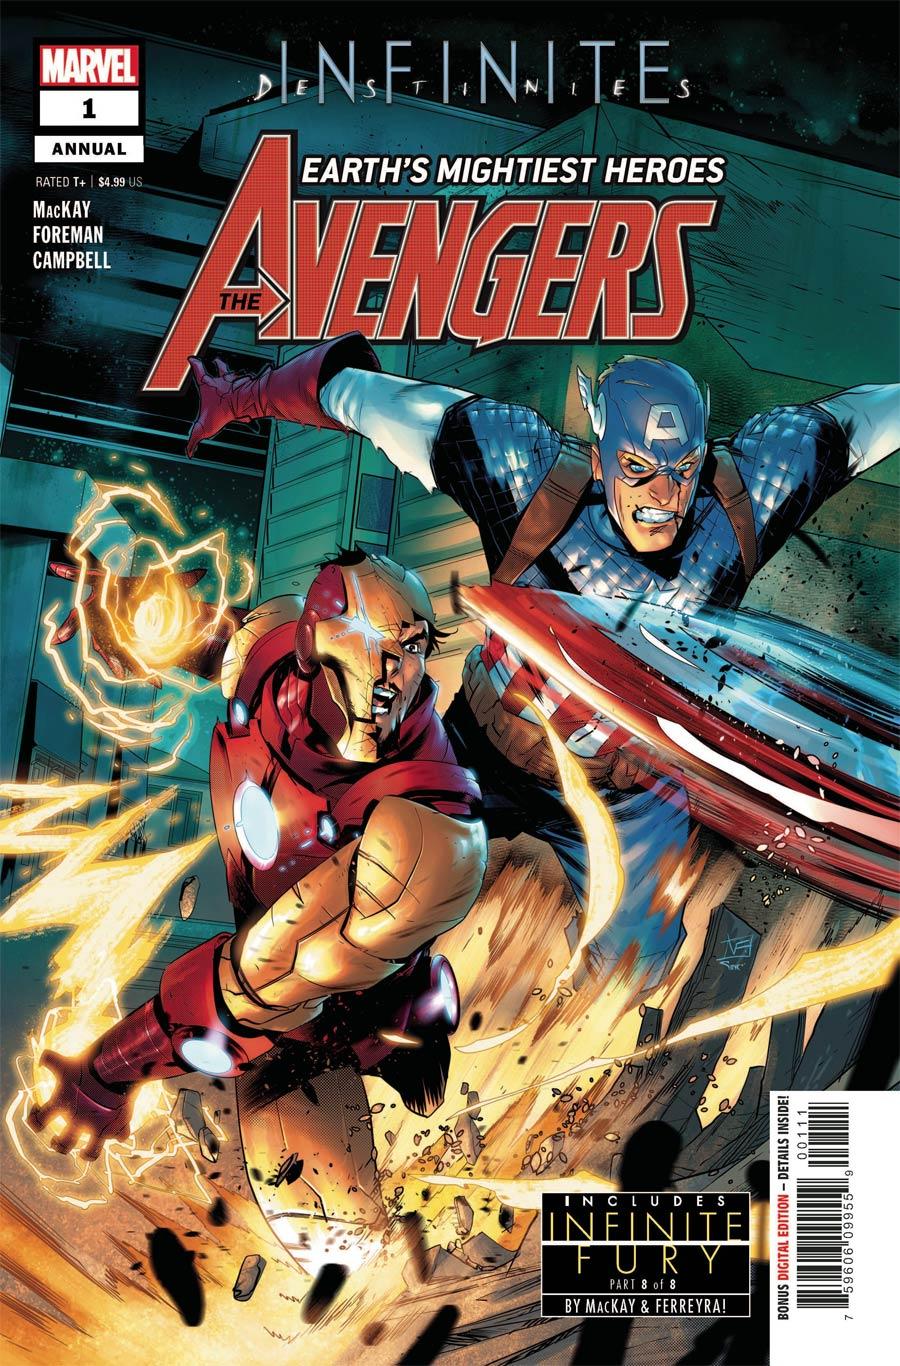 Avengers Vol 7 Annual #1 Cover A Regular Federico Vicentini Cover (Infinite Destinies Tie-In)